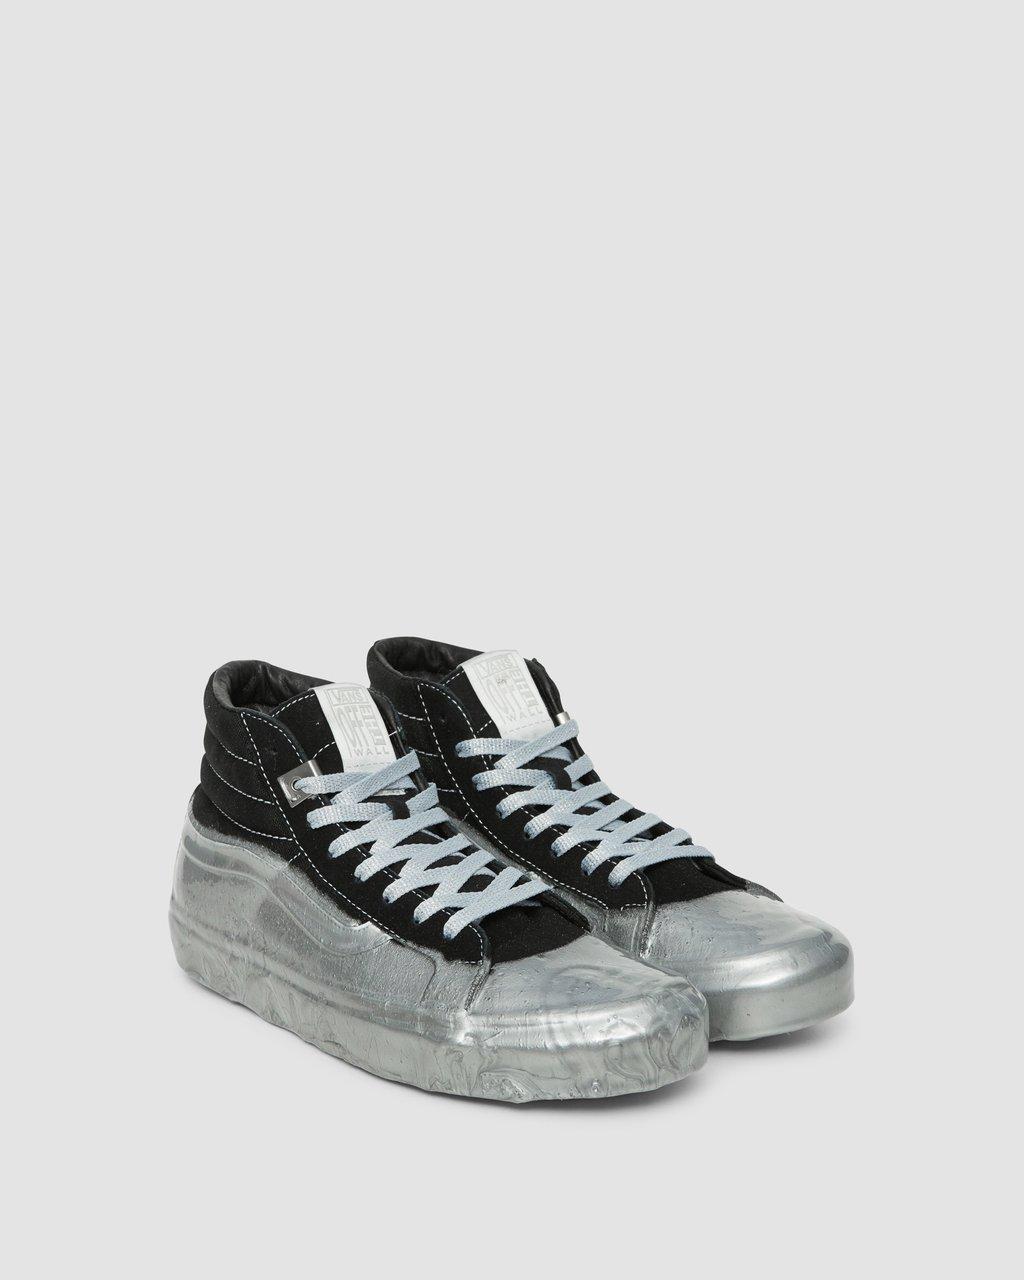 4fd9b7205935d8 Trick Or Sneak  Alyx Studio X Vans OG Sneakers